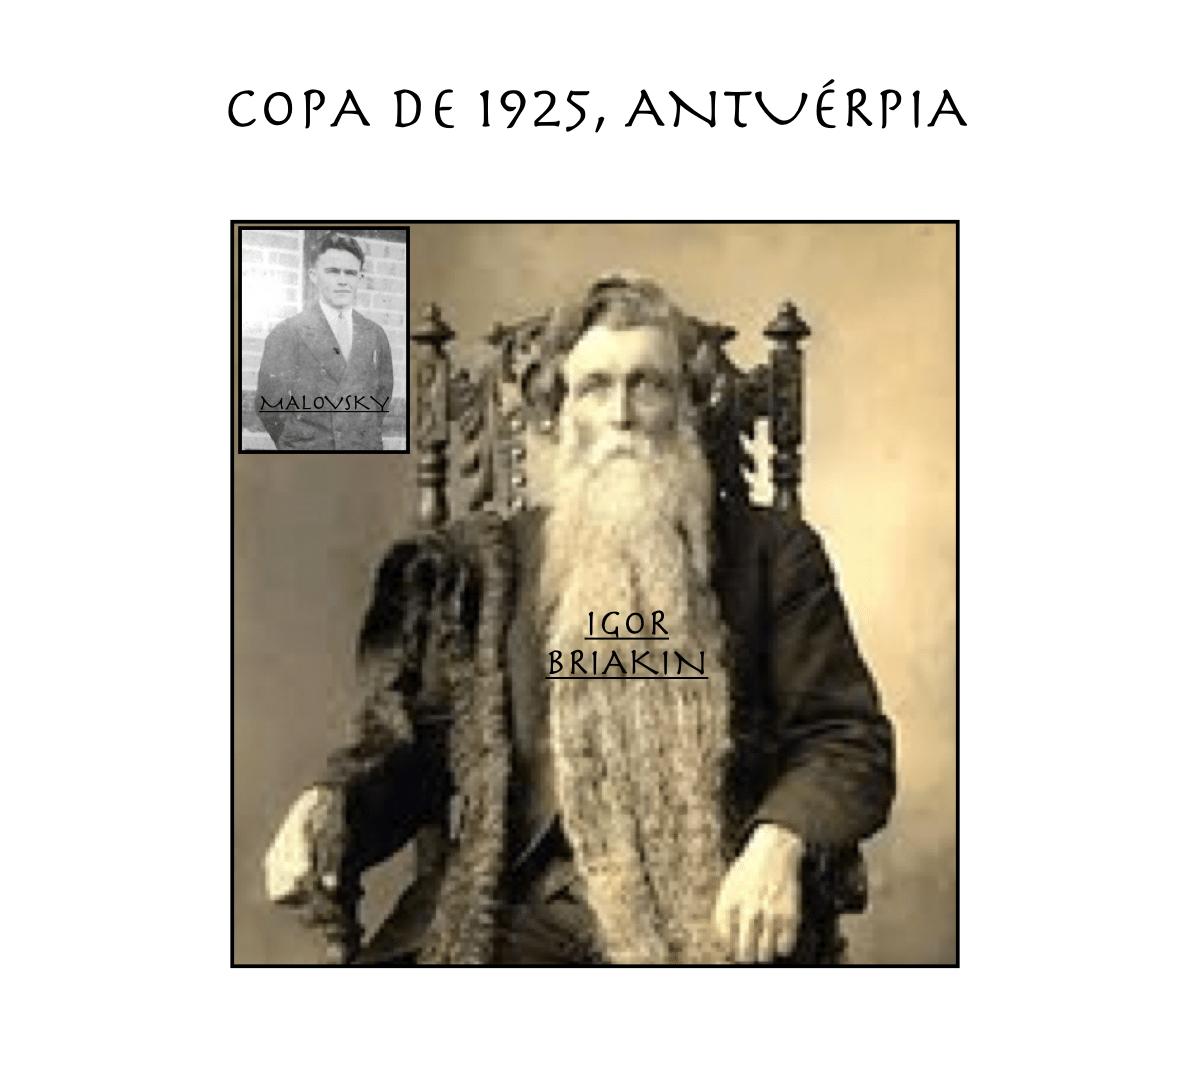 CANAISMB140710MEMECOPA1925